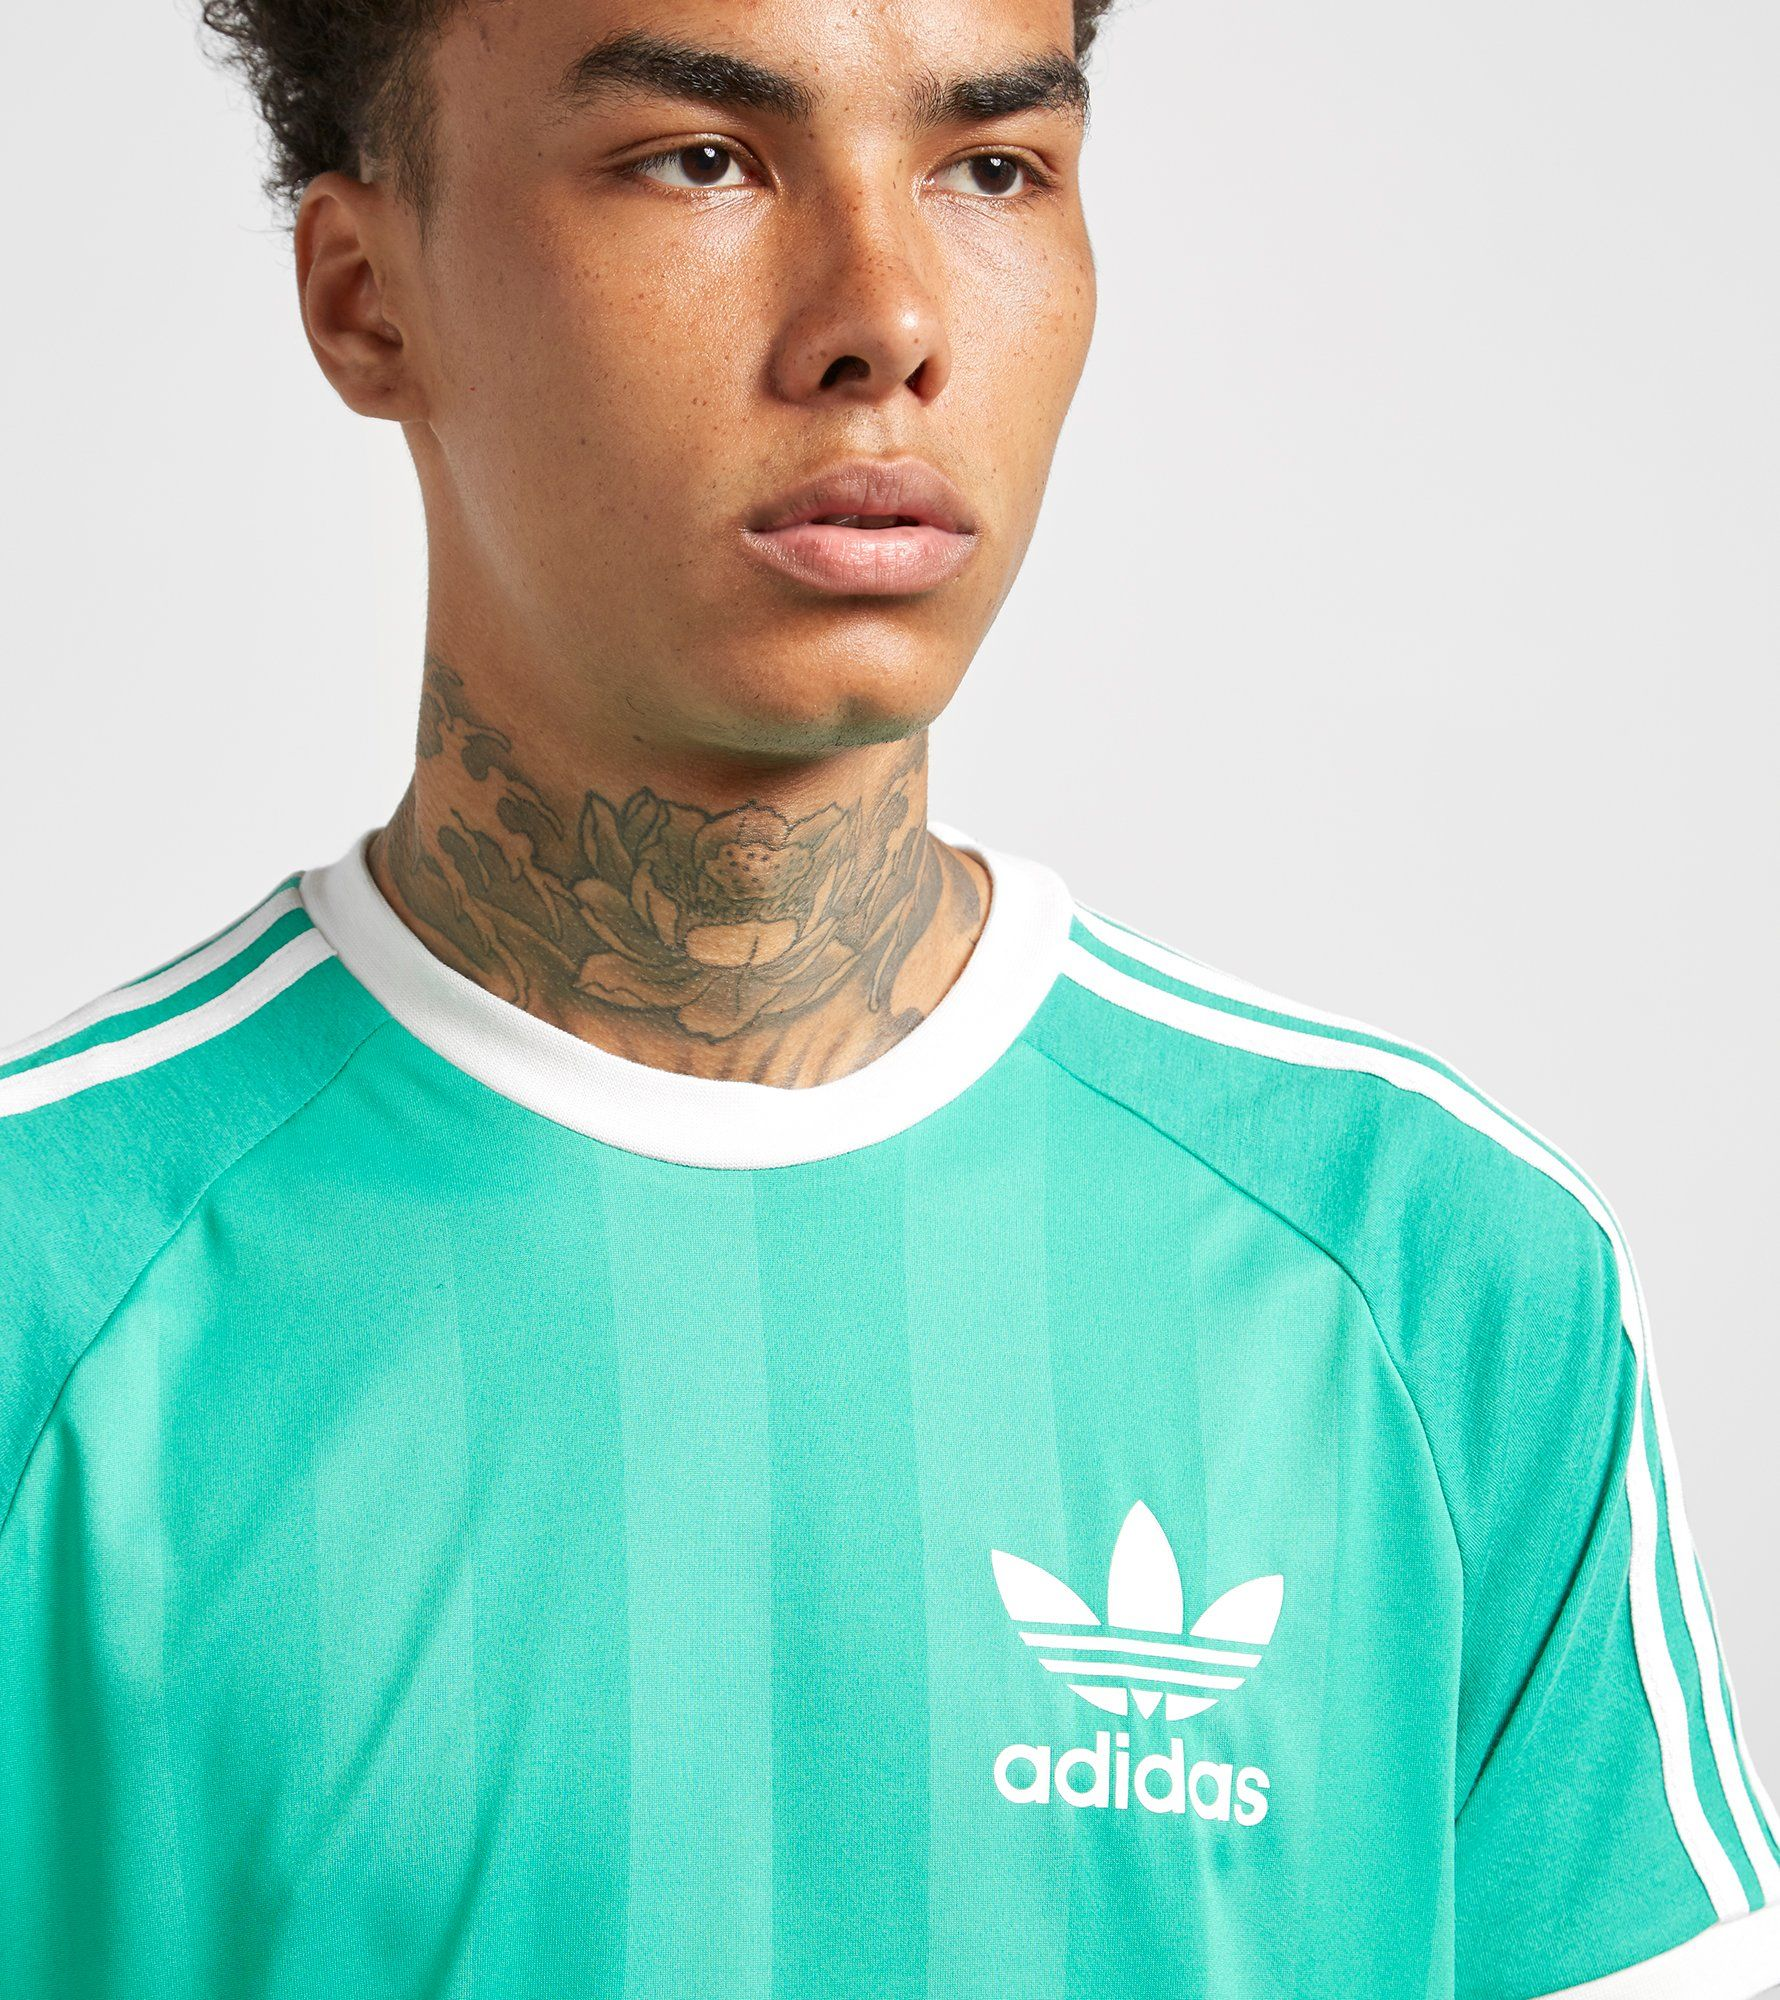 adidas Originals California Trefoil Short Sleeve T-Shirt